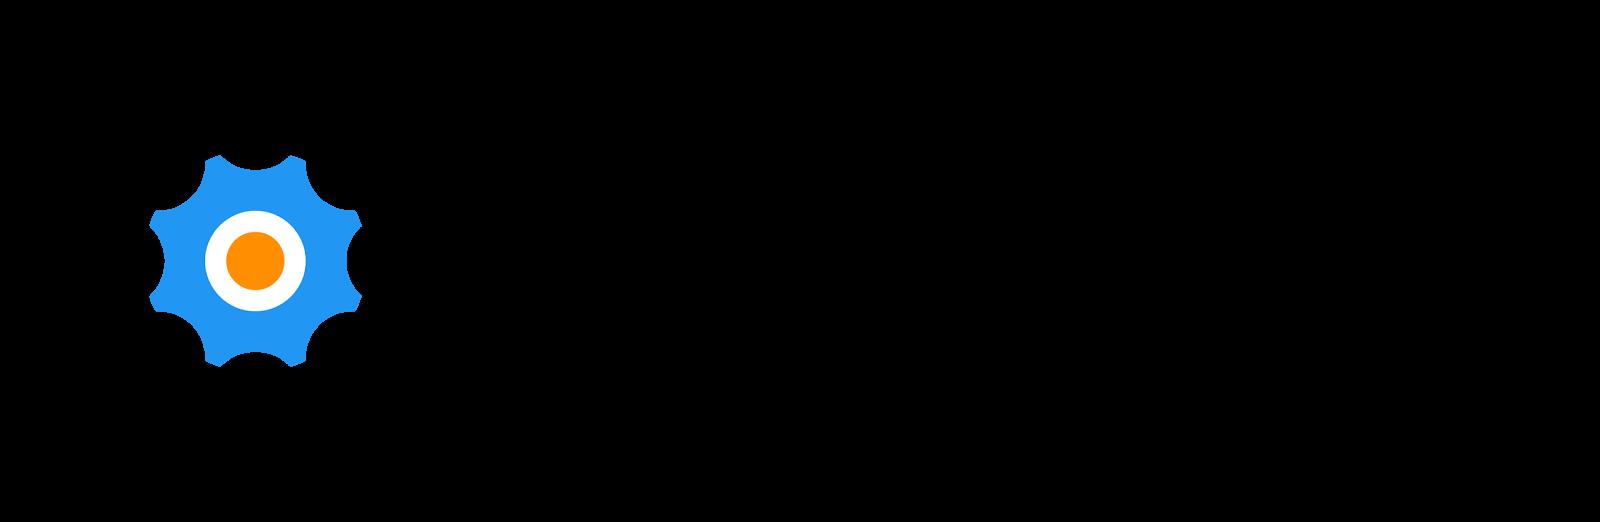 logo google code-in smak 1